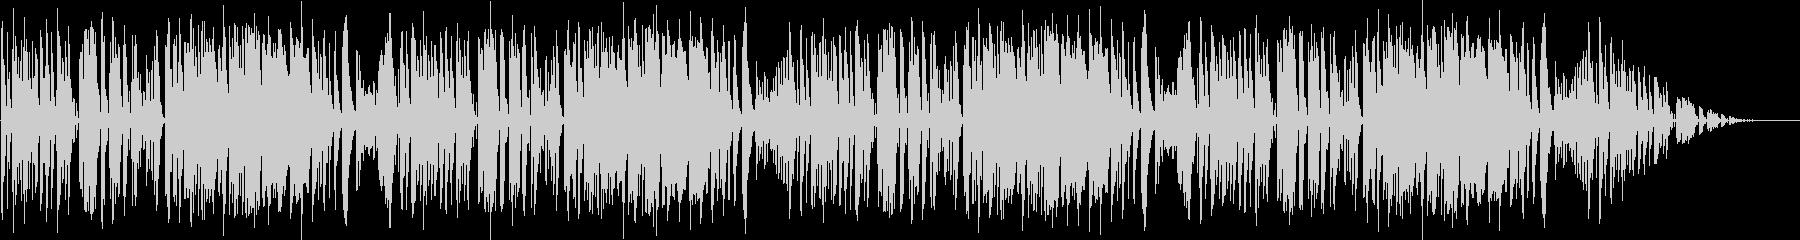 bgm43の未再生の波形